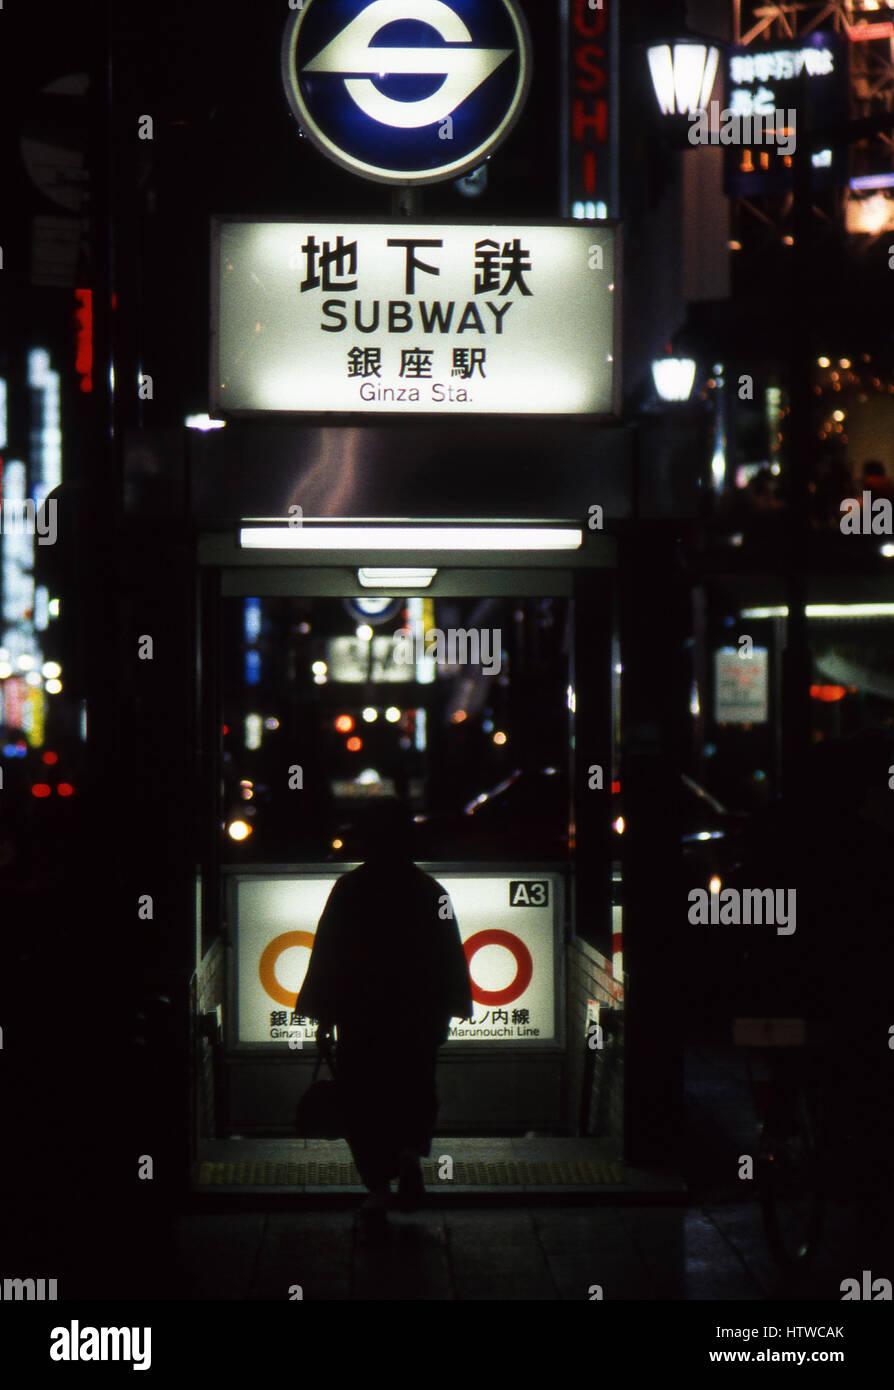 Ginza subway station in Tokyo at night. - Stock Image